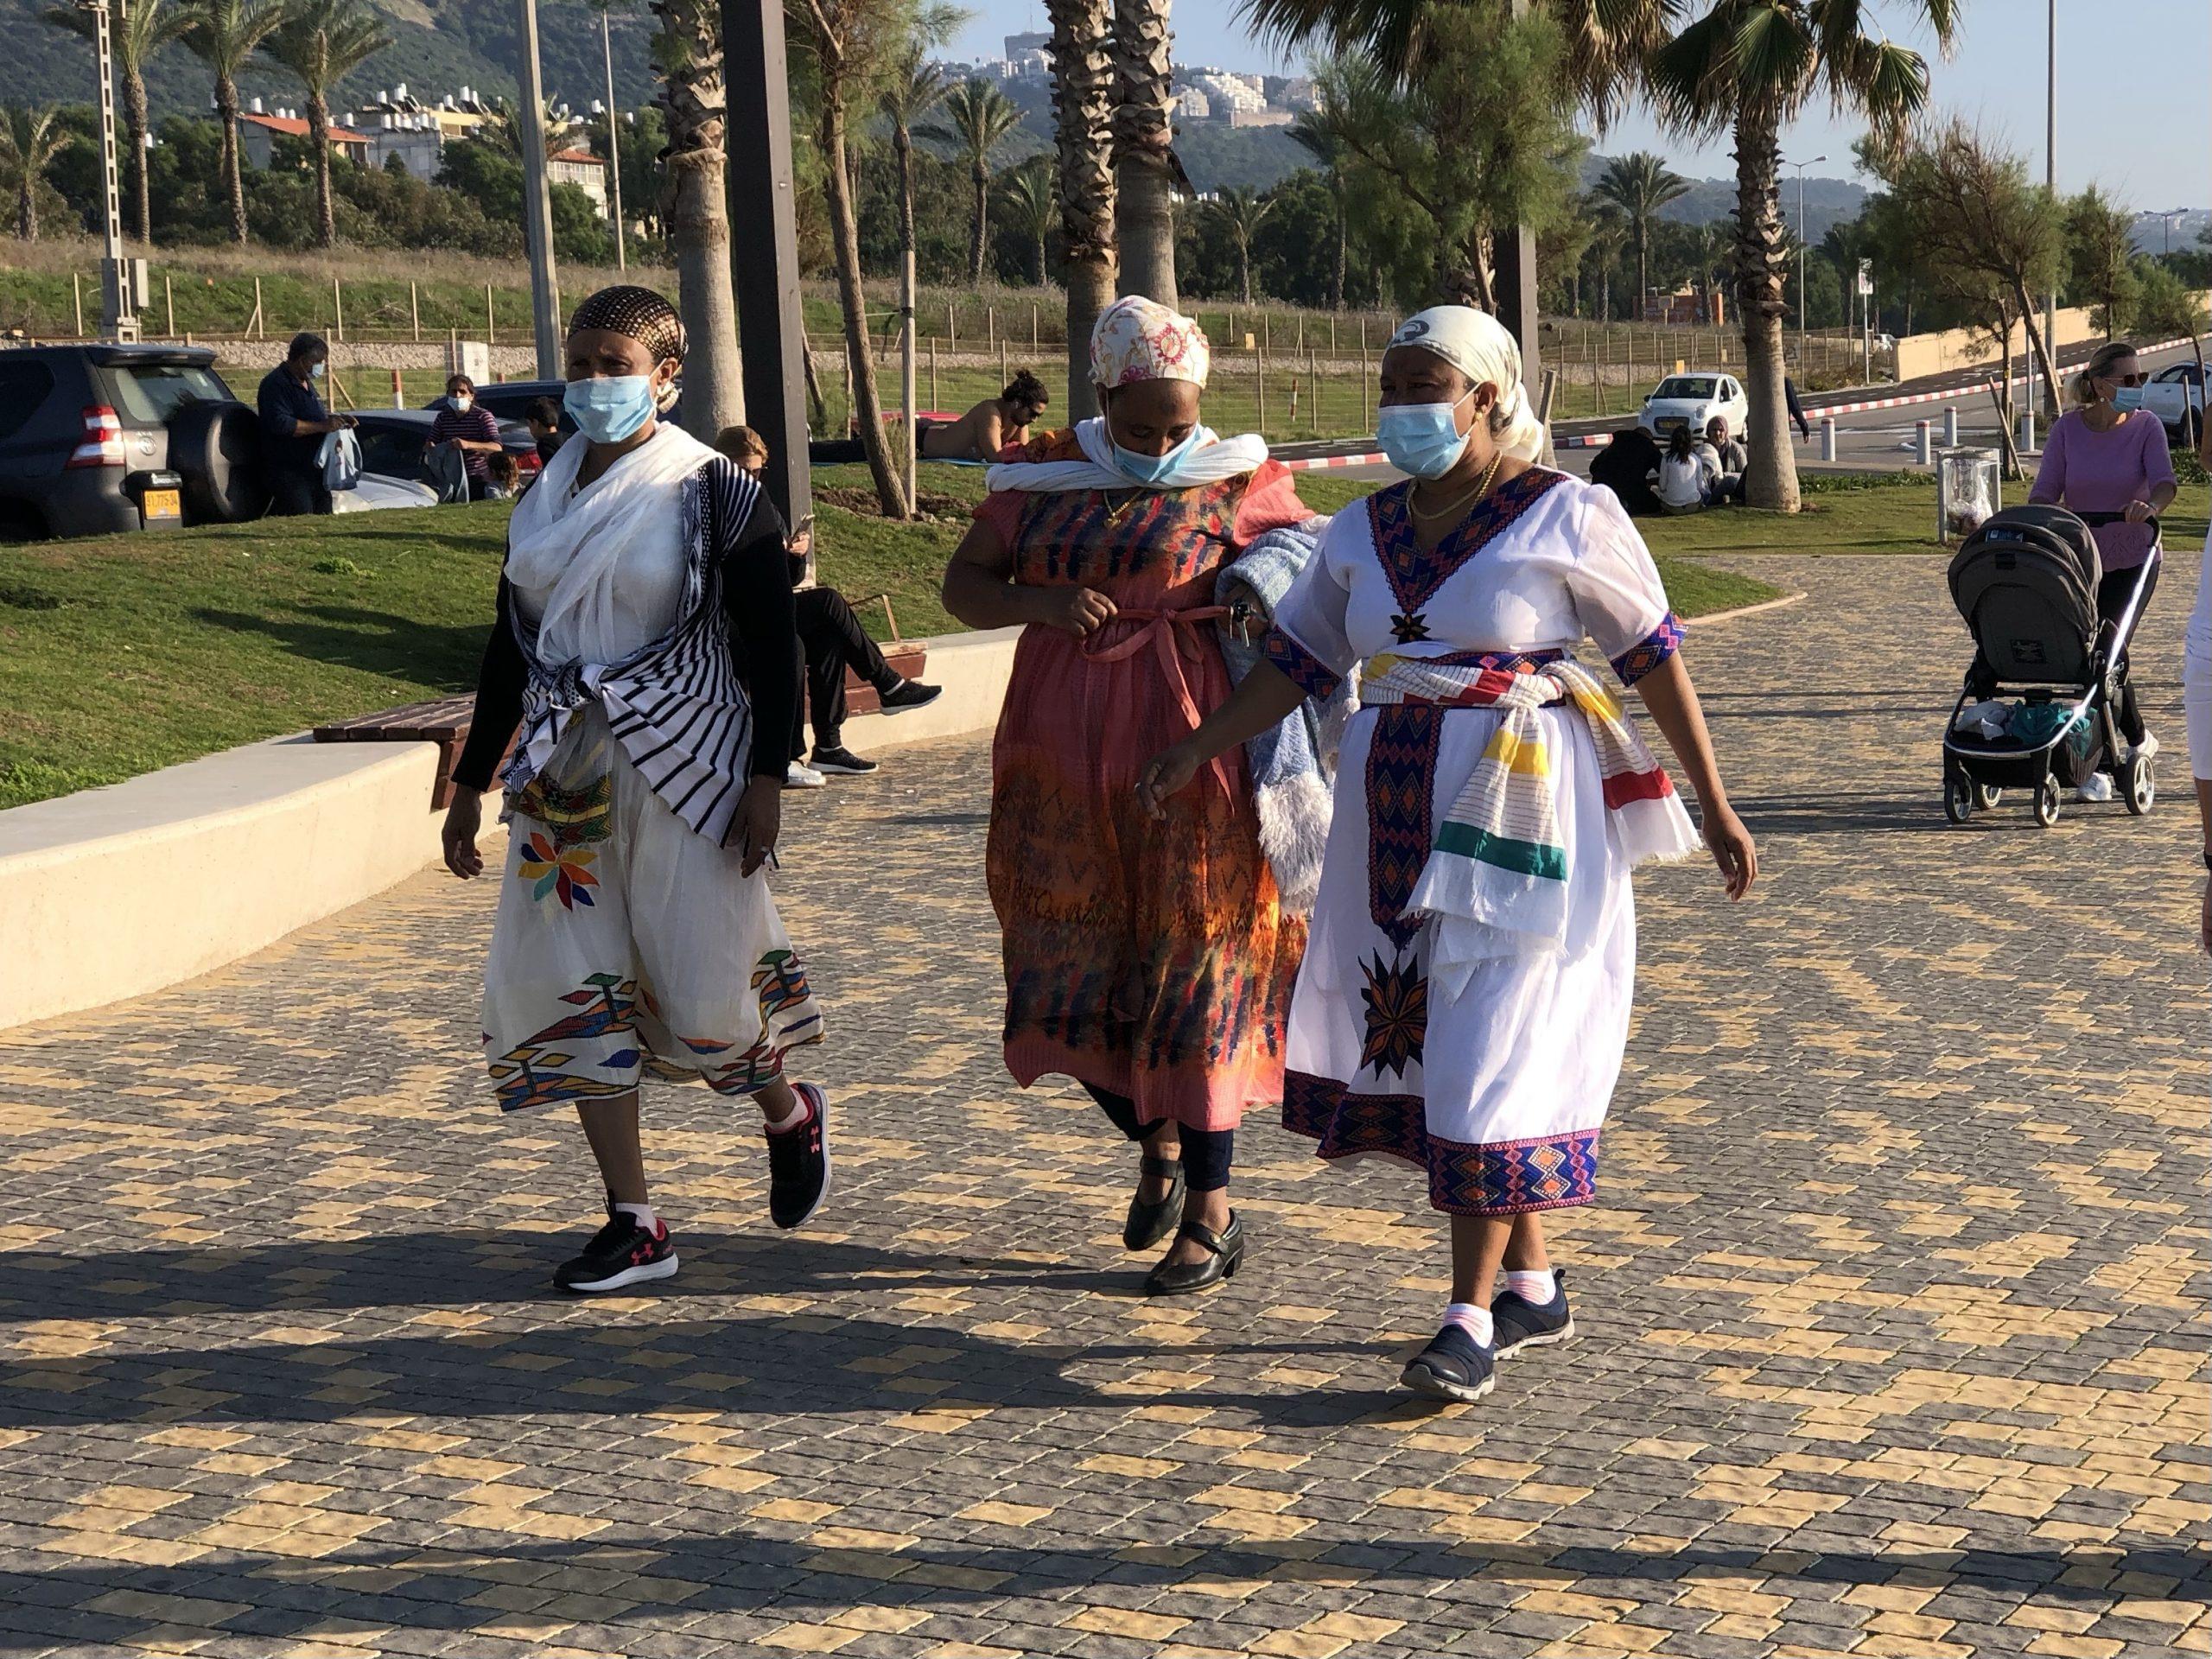 Ethiopian immigrants get warm welcome in Israel